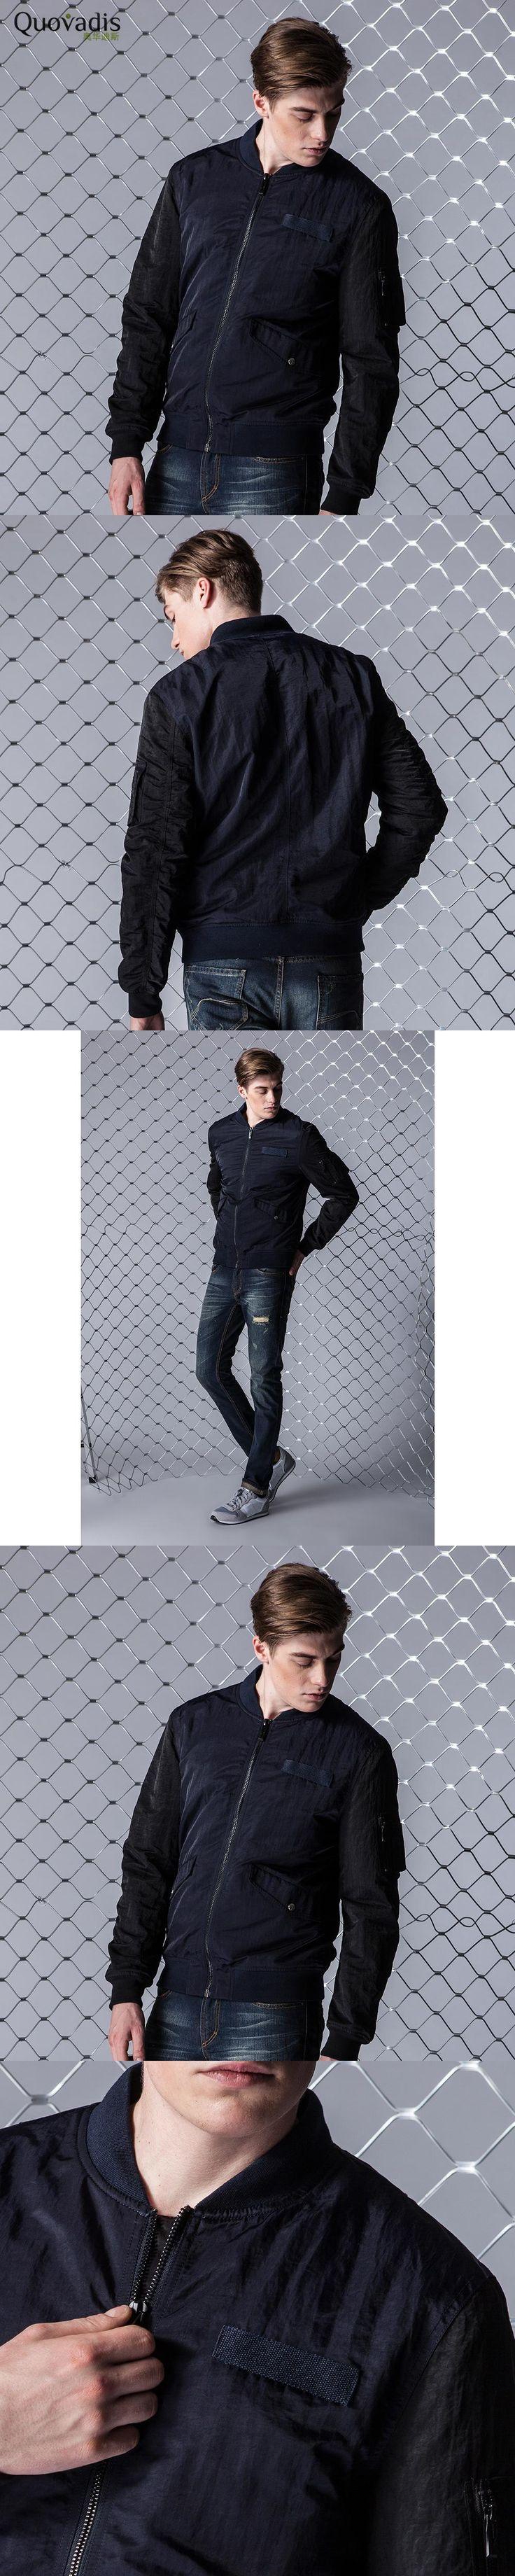 2017 Autumn casual Man Loose Coat fashion Korean bomber Jacket Handsome Joker Jacket oversize Zipper jaqueta masculino bape 8822